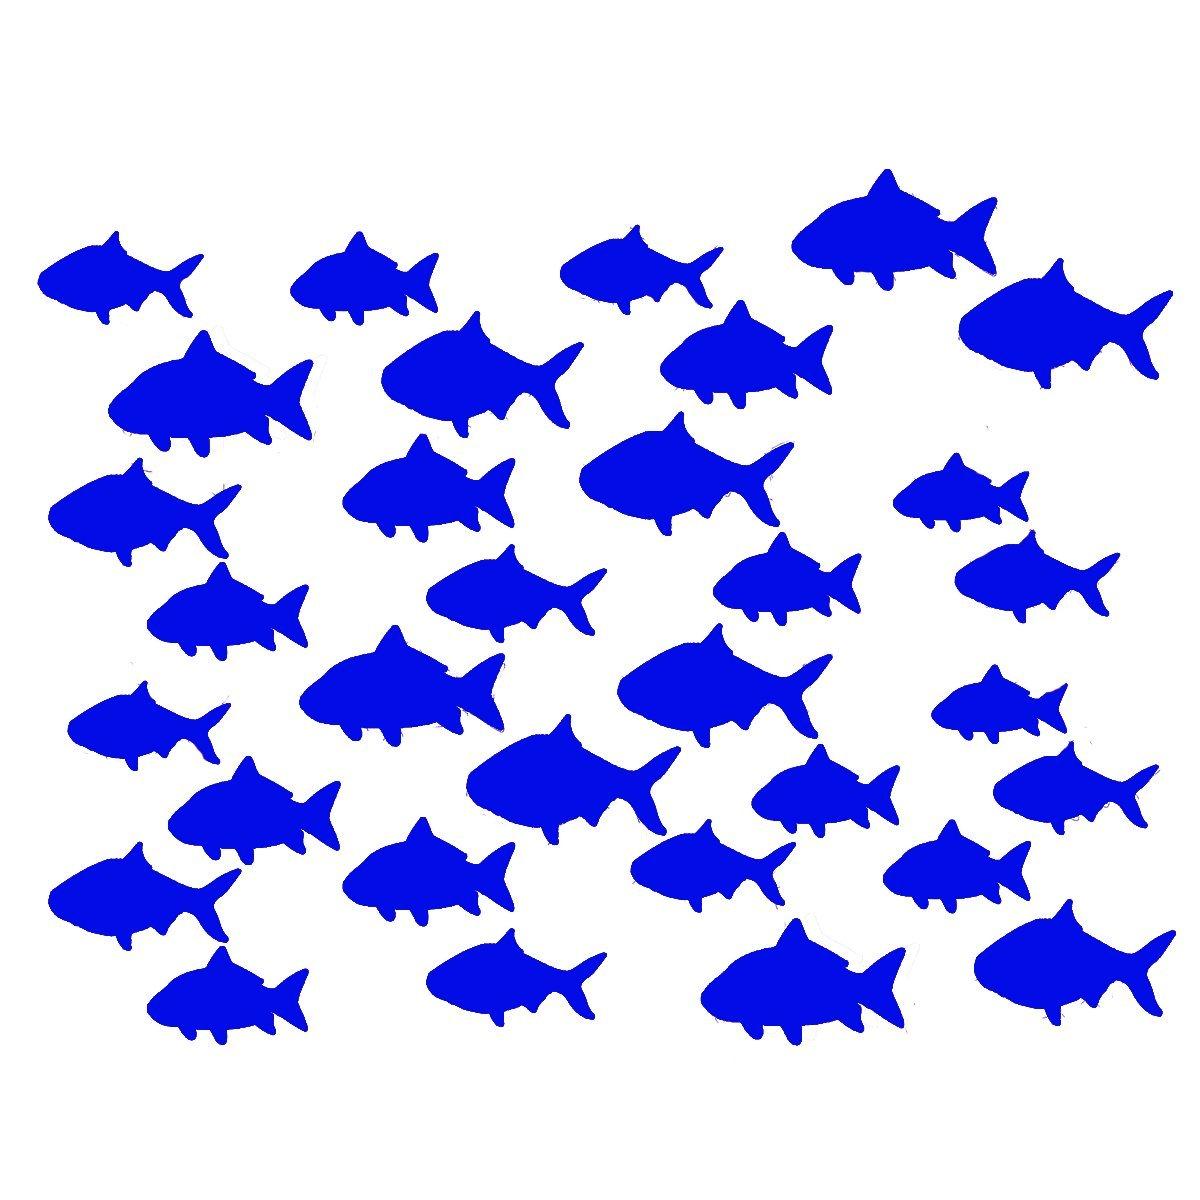 VWAQ Aquatic Animal Stickers, School Of Fish Wall Decor - Peel and Stick Decal, 32 Pack VWAQ (White)